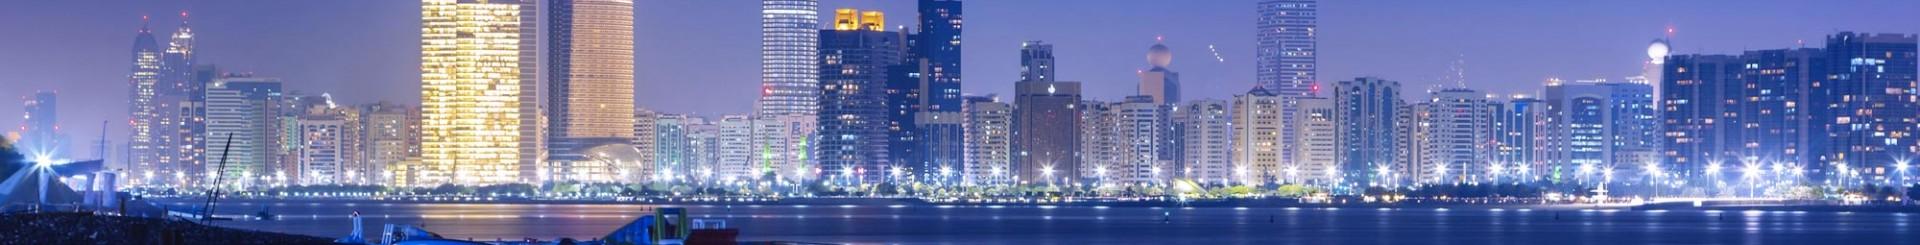 Voyage à Abu Dhabi